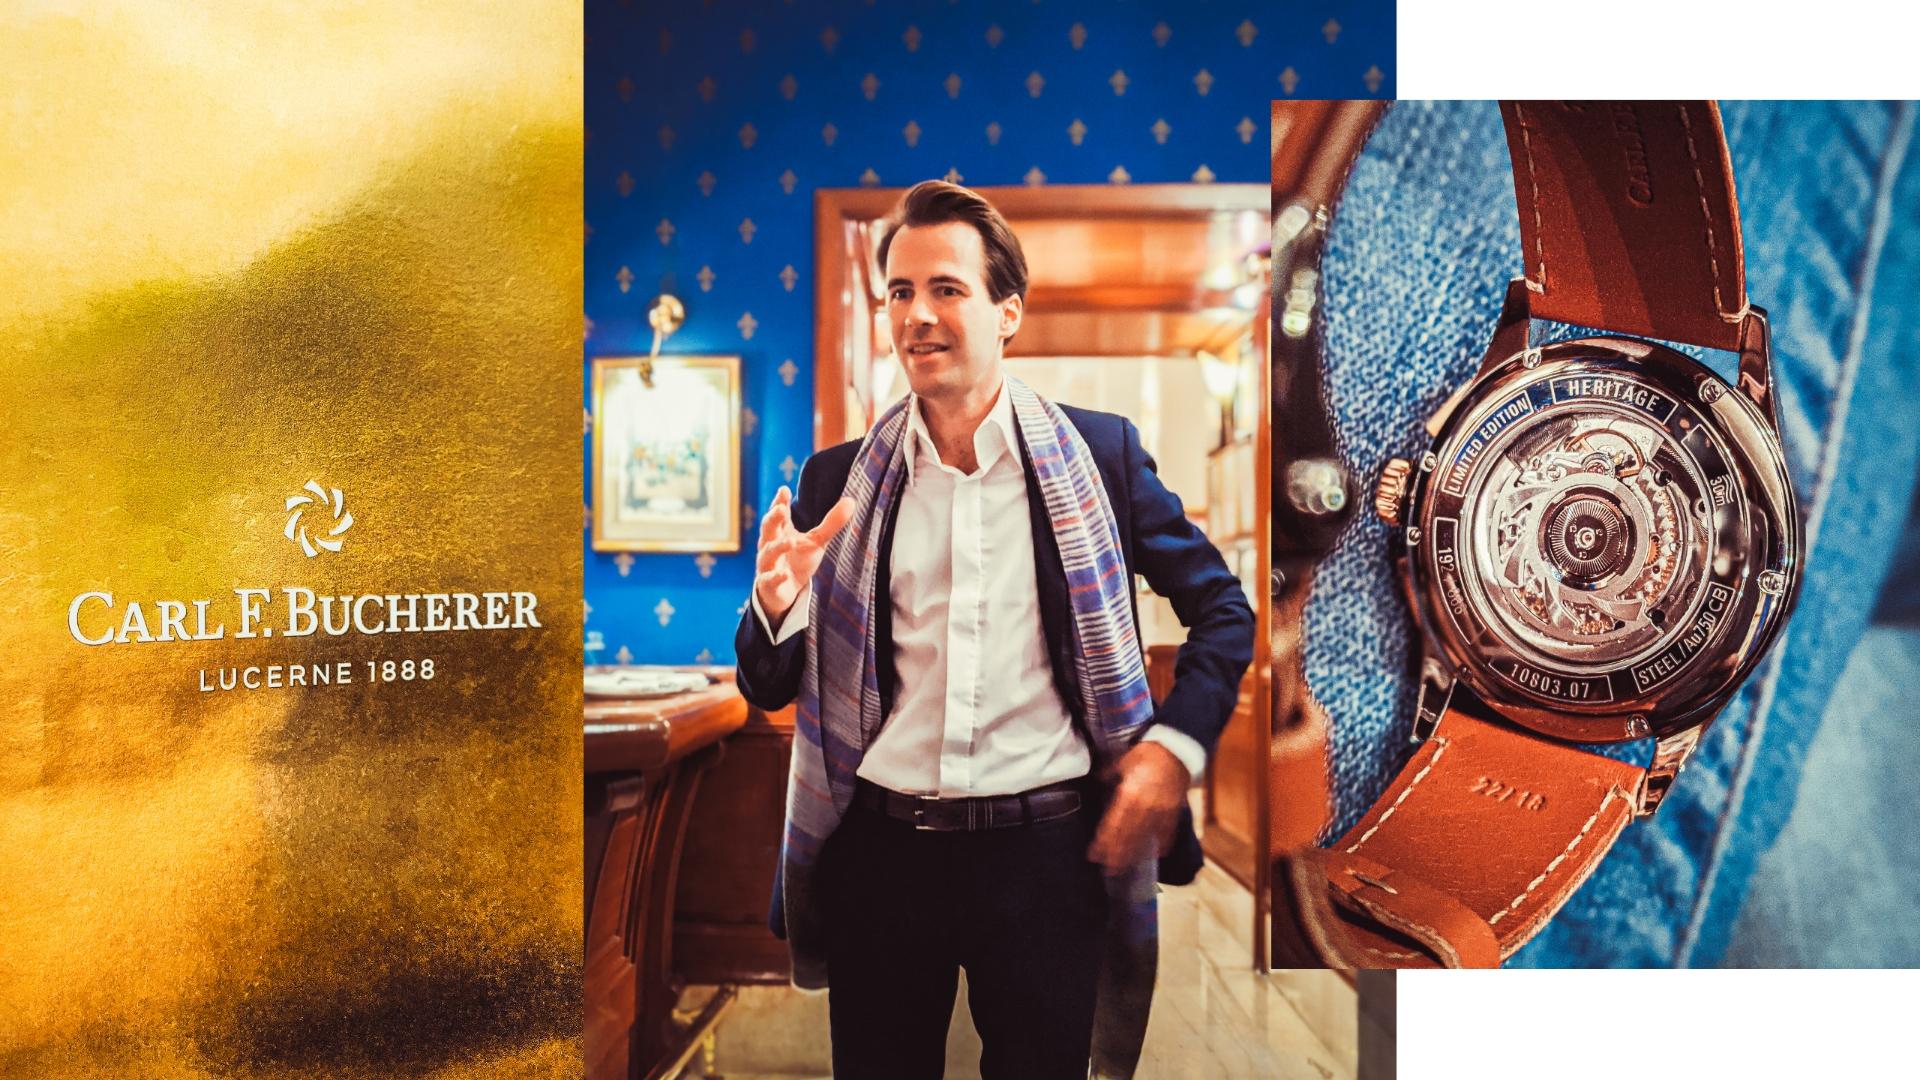 carl f bucherer, 1888, bucherer, india, laurent lecamp, larentlucerne, pashmina, timepieces, eyesforluxury, watches, panda watch, manta, black manta, recycled plastic, rose gold, steel, titanium, unisex watch, mens watch, womens watch, ethos watches, the imperial hotel, blue room, leather strap, flyback, ceramic dial, annual calendar, luxury timepieces, luxury watches, new delhi, india, made of lucerne, made in switzerland, wordswork pr, wordswork public relations, heritage bicompax annual, bicompax